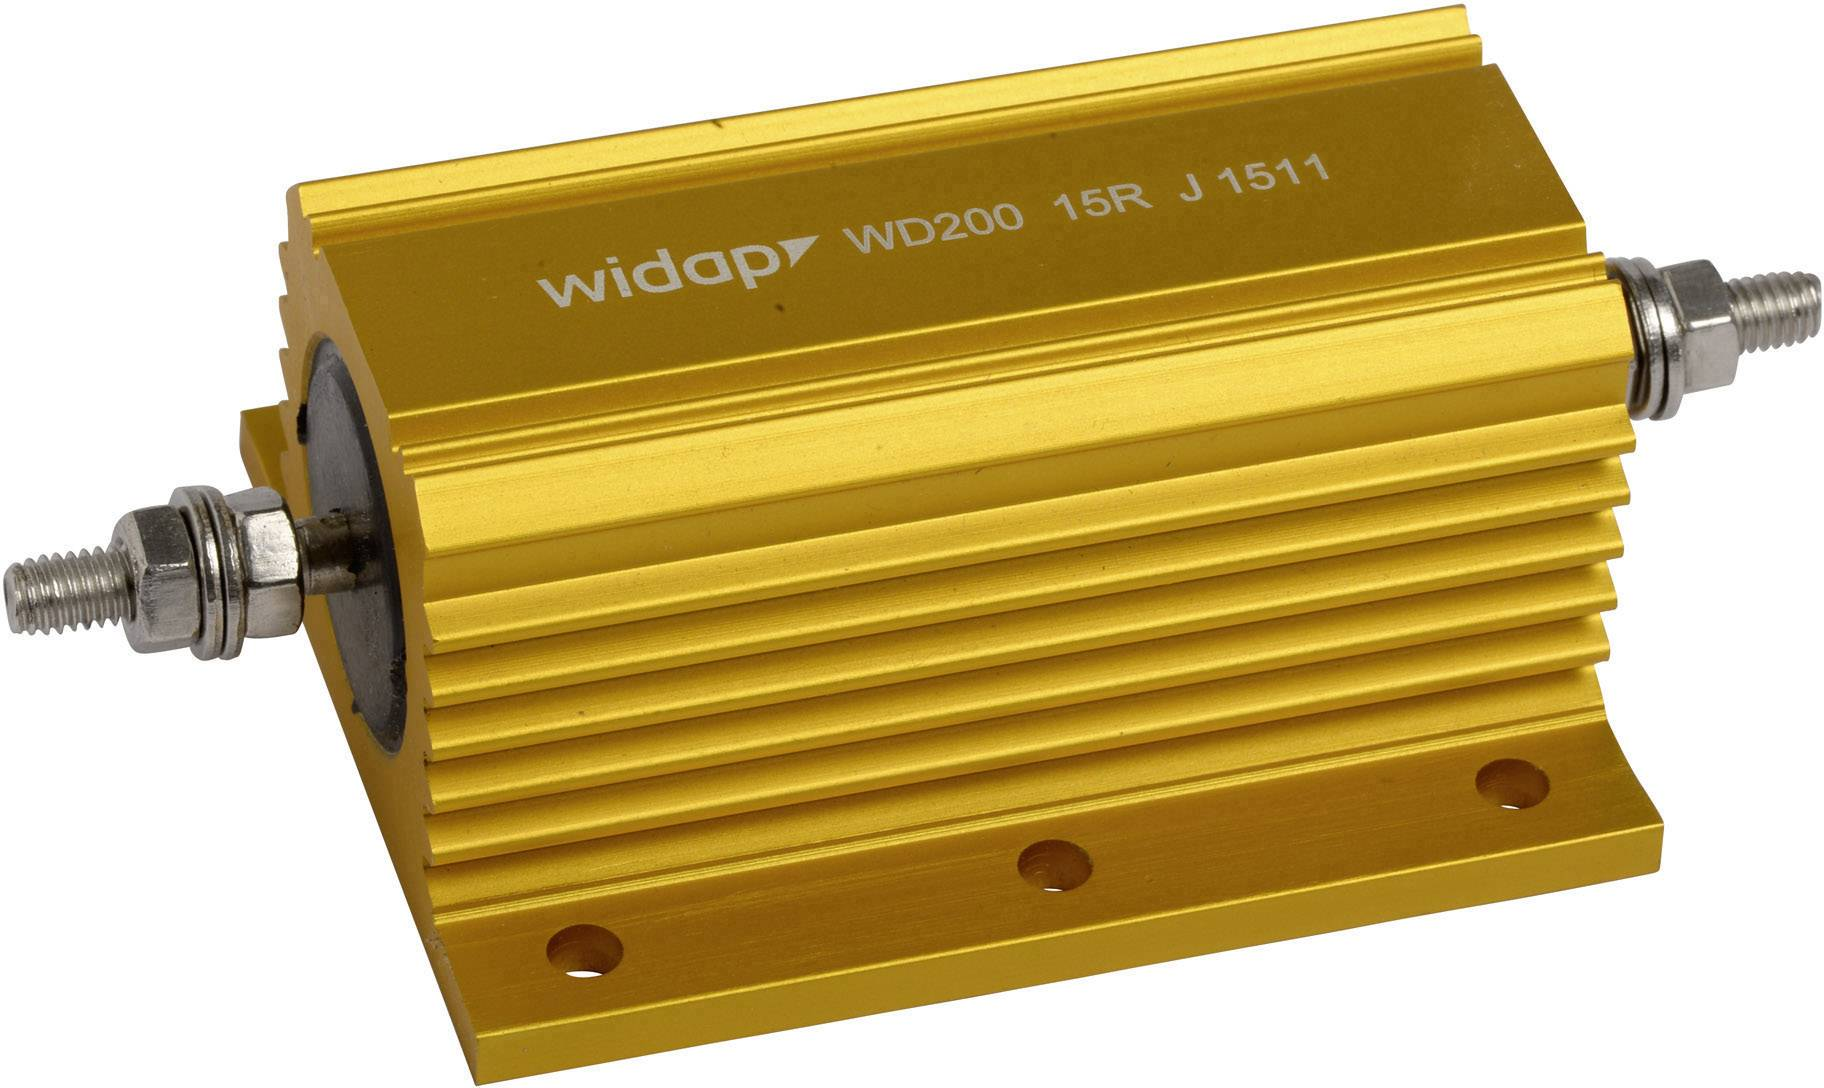 Drôtový rezistor Widap 160150, hodnota odporu 10 Ohm, 200 W, 1 ks